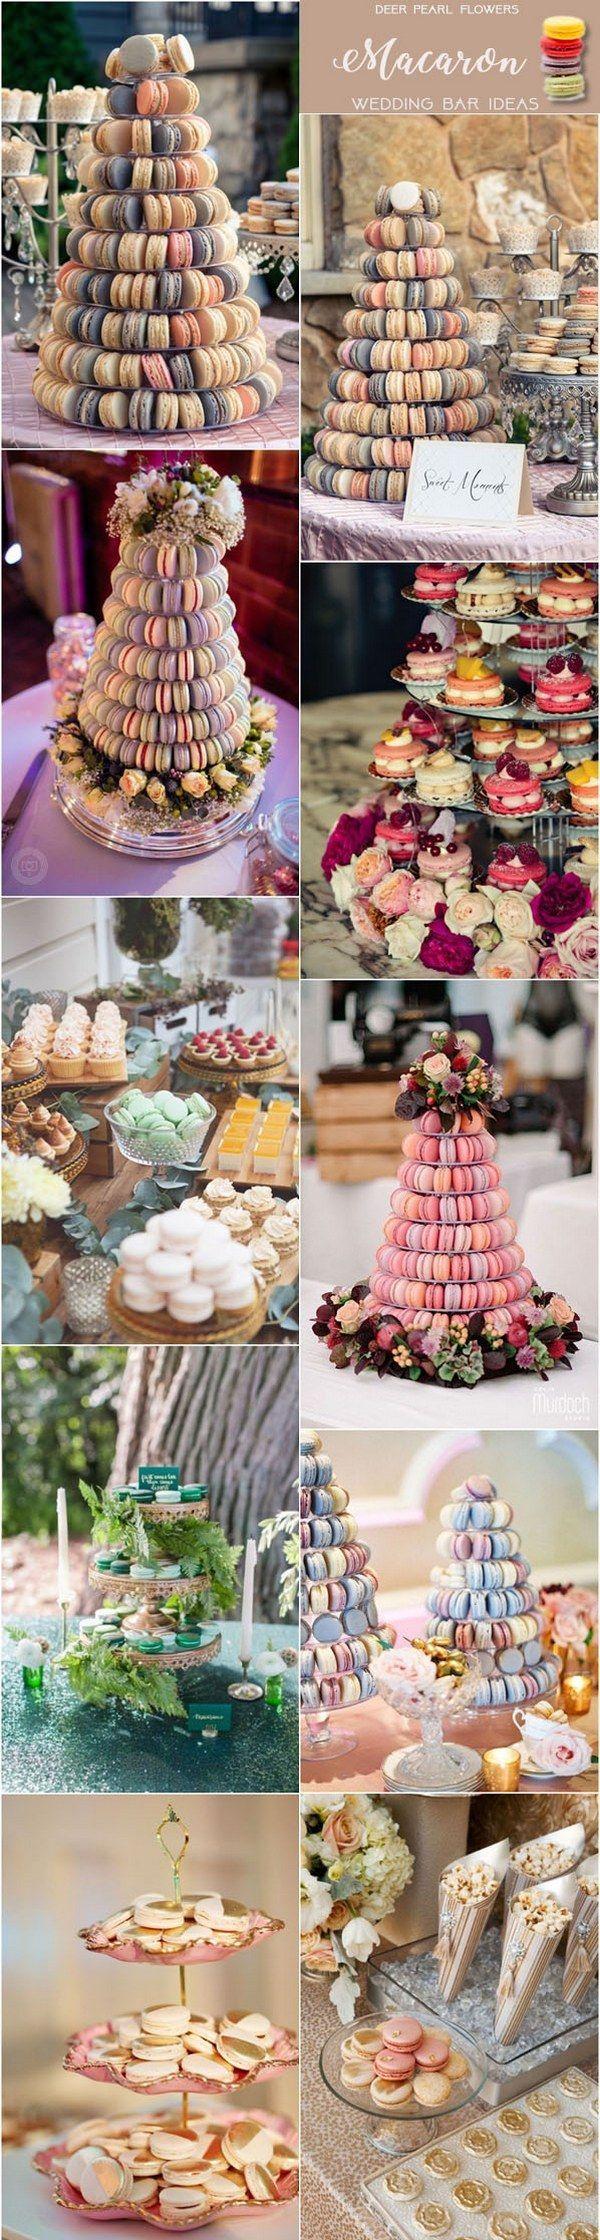 Wedding decorations for hall january 2019  best Wedding Reception Ideas images on Pinterest  Wedding ideas